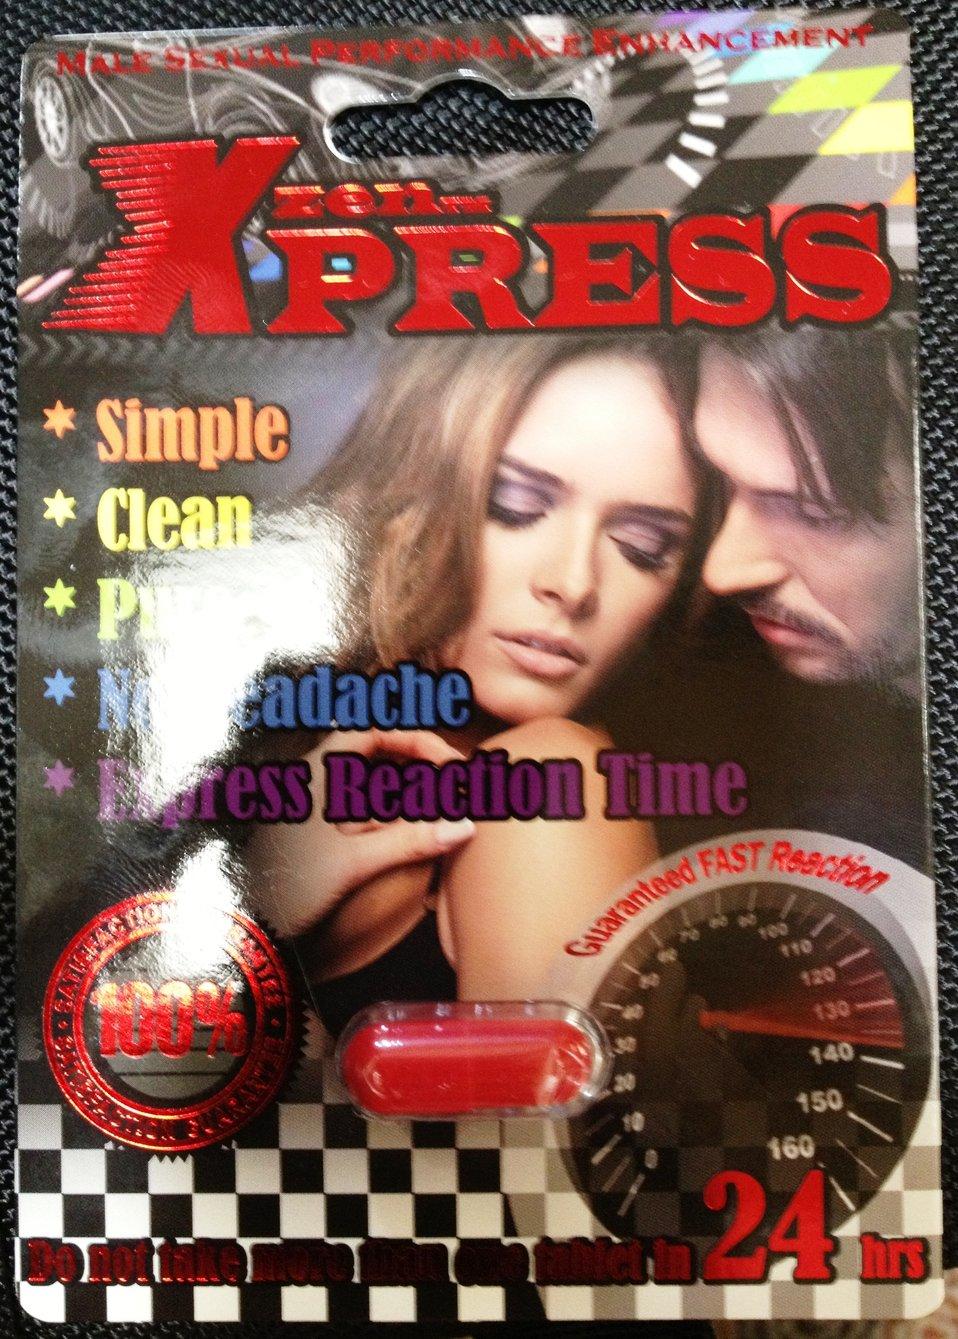 XzenPress